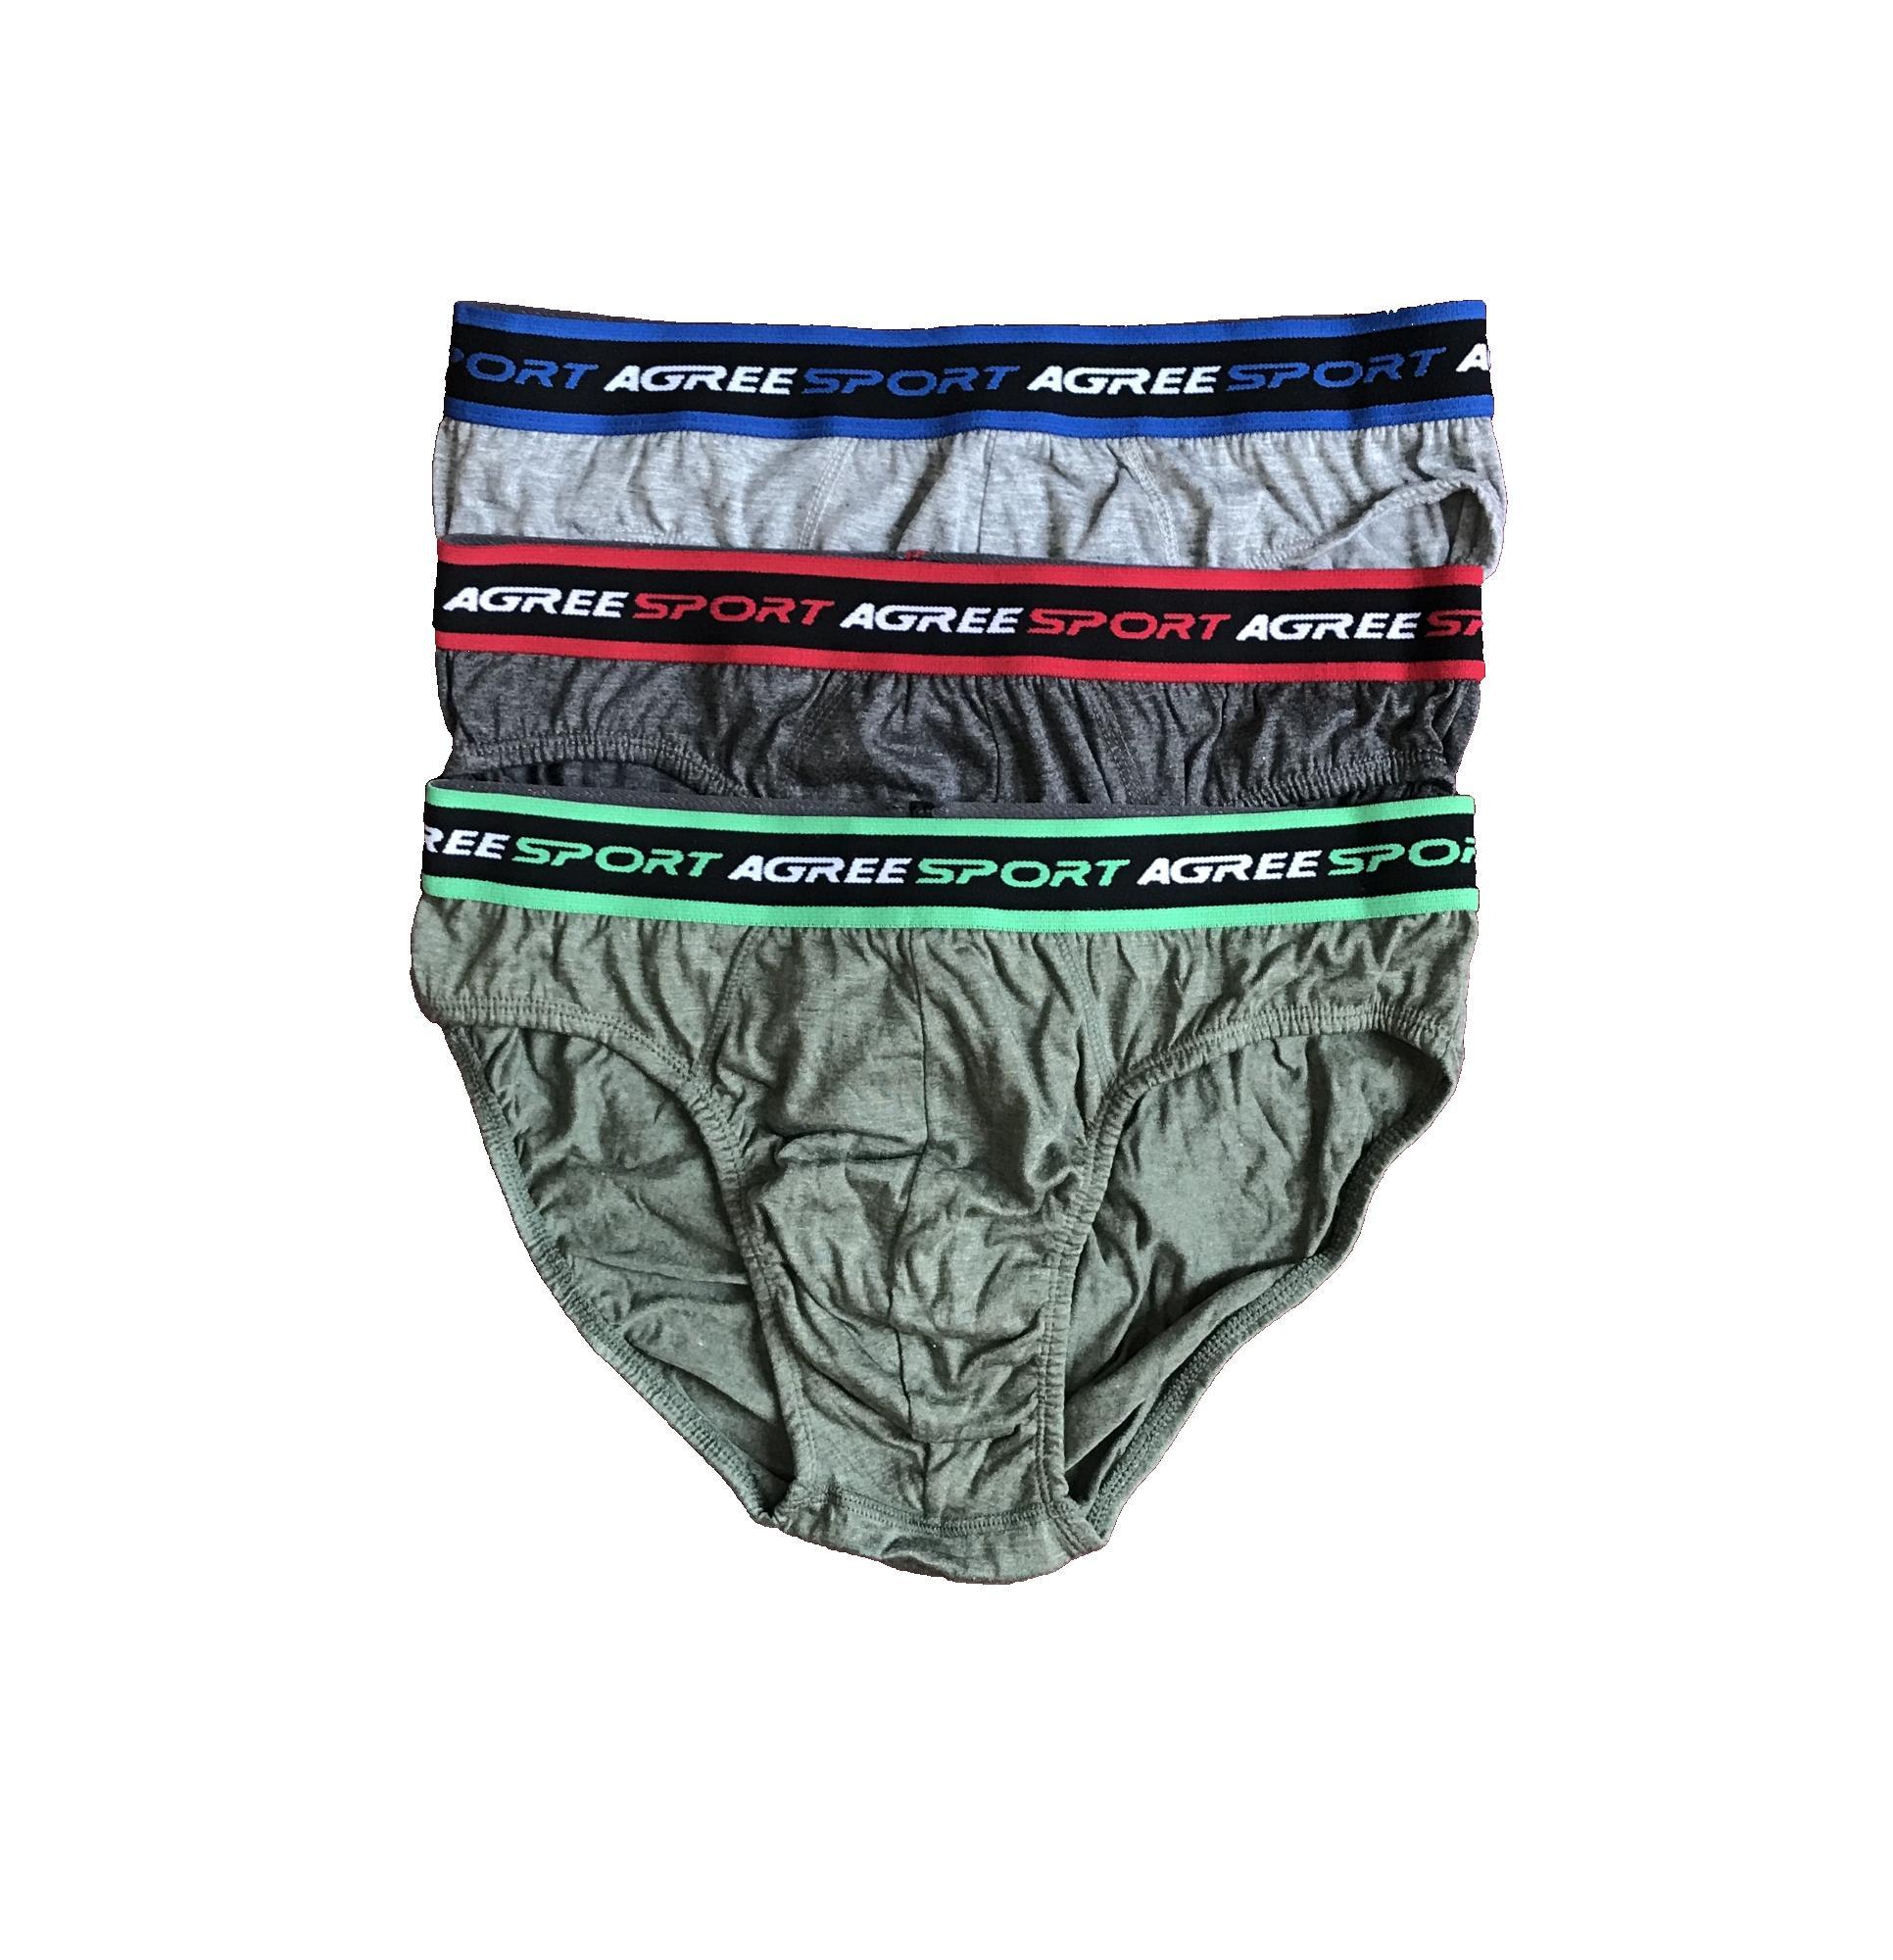 PADIe - 3 PCS Celana Dalam Pria Boxer AGREE SPORT Multi Colour /sempak/underwear Laki-laki